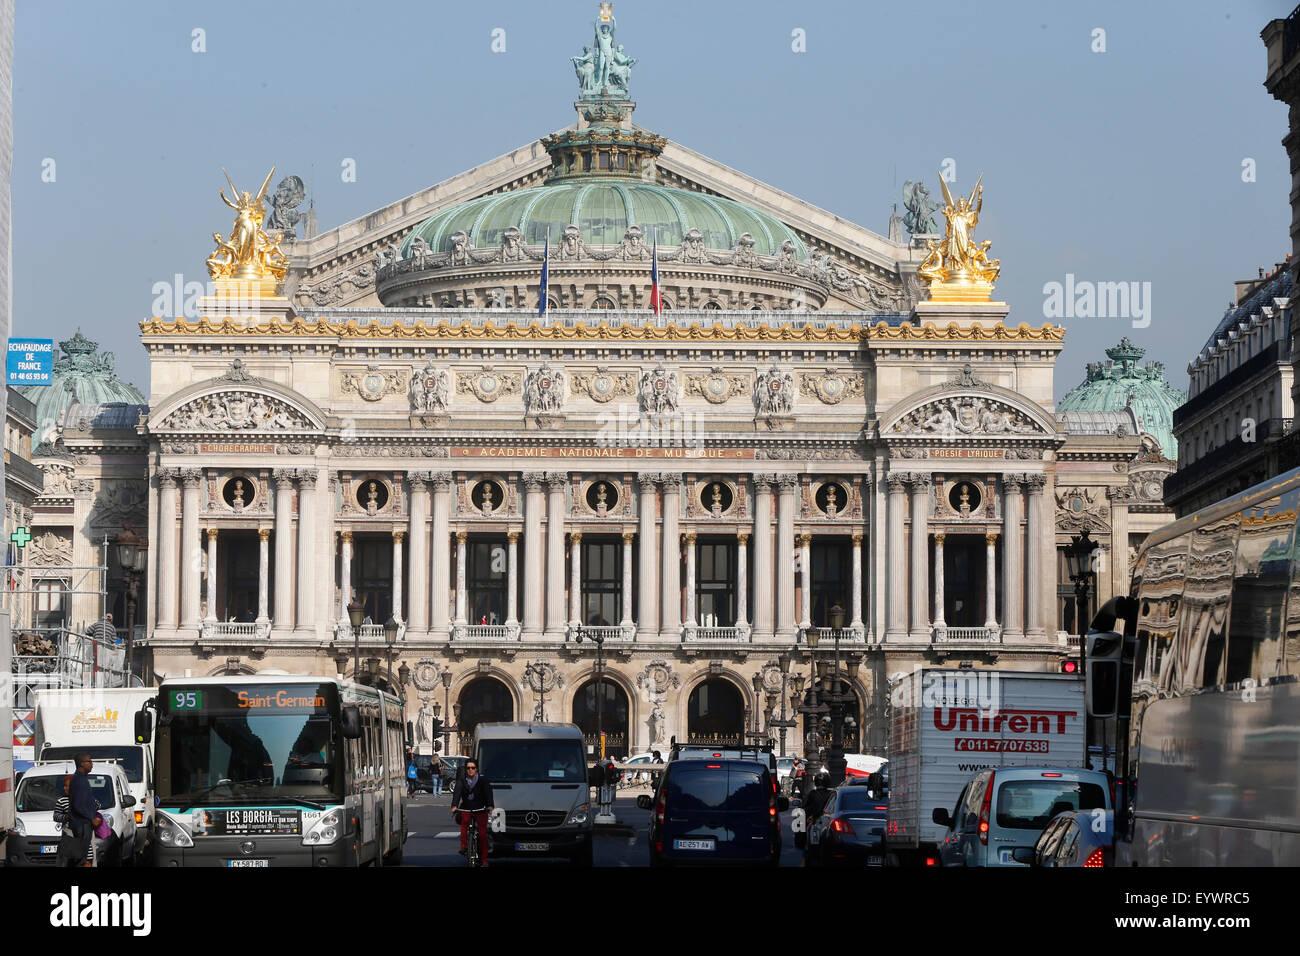 Palais Garnier, Paris Opera, Paris, France, Europe - Stock Image